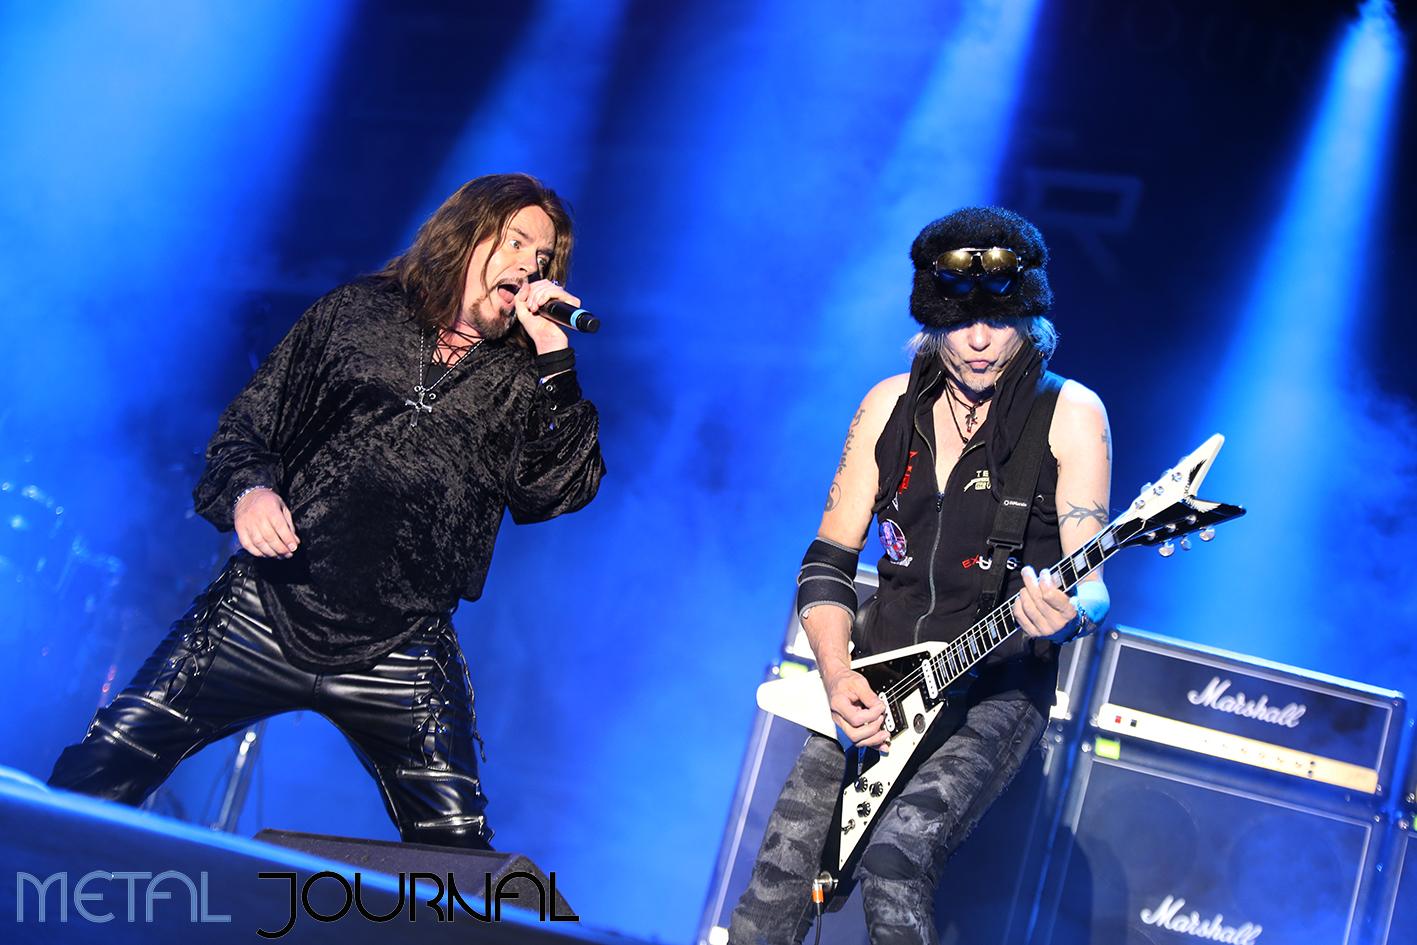 michael schenker fest - metal journal rock fest barcelona 2019 pic 11